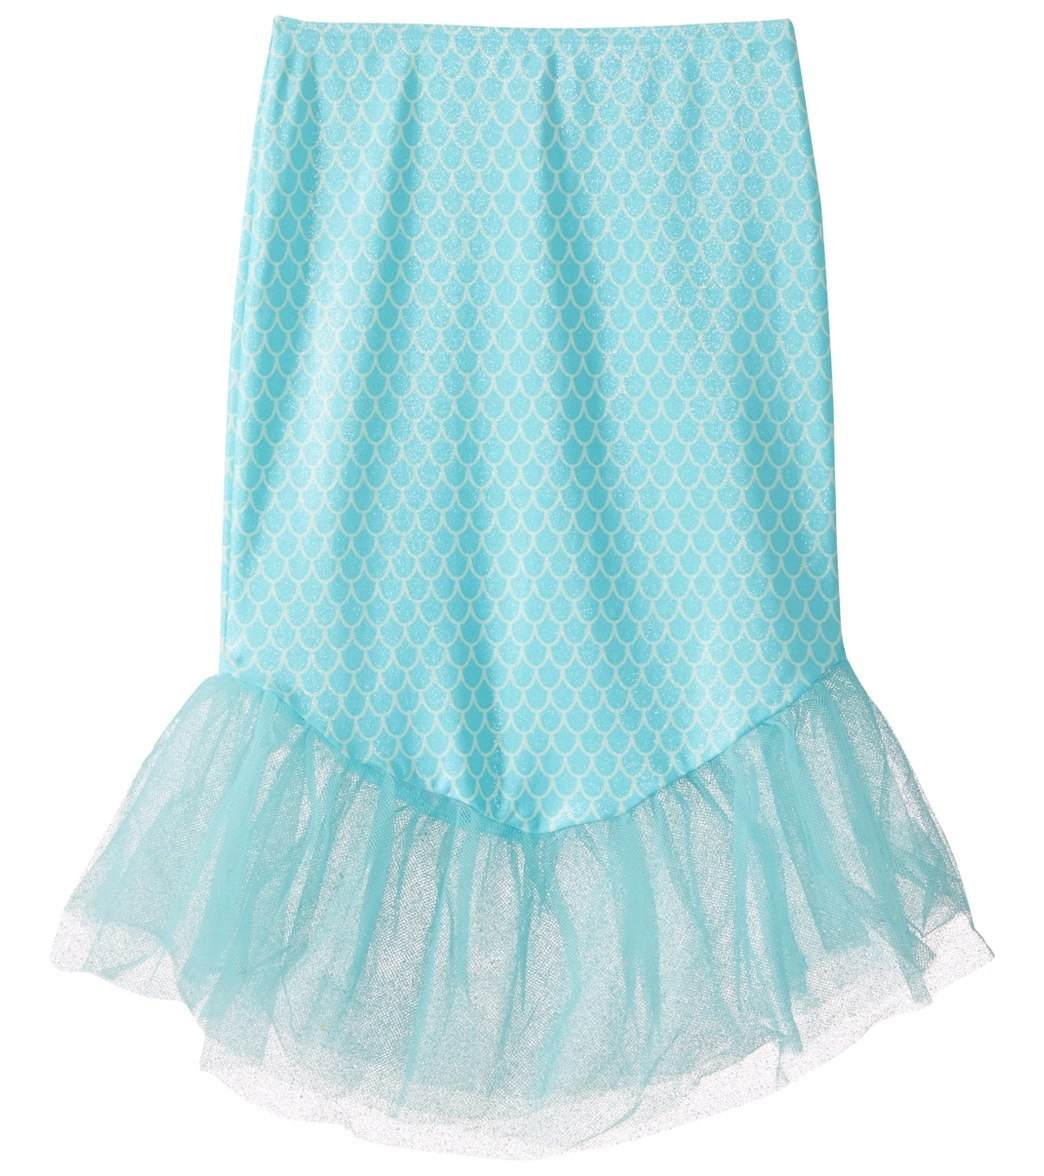 ed84ac6d92 Hula Star Girls' Mermaid Princess Cover Skirt (Little Kid) at SwimOutlet.com